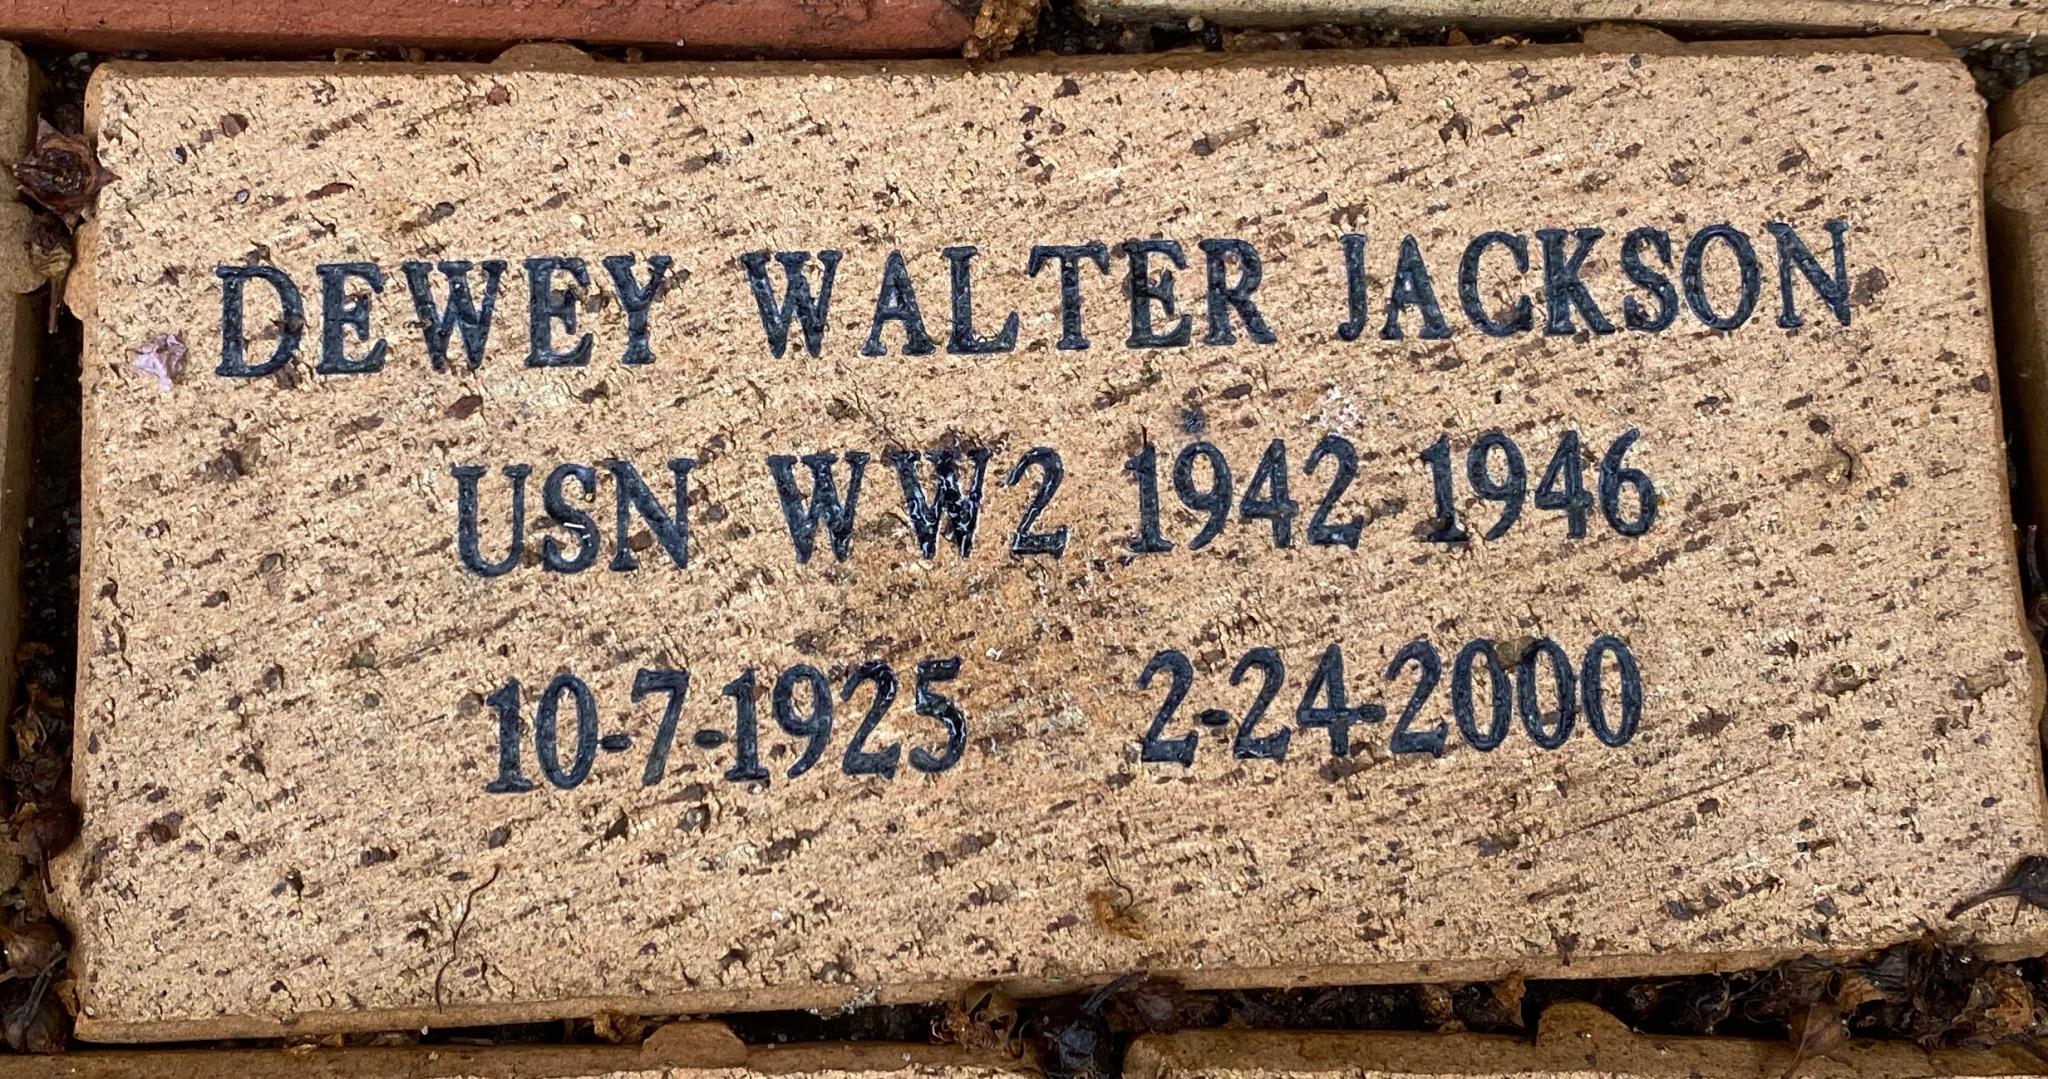 DEWEY WALTER JACKSON USN WW2 1942 1946 10-7-1925 2-24-2000